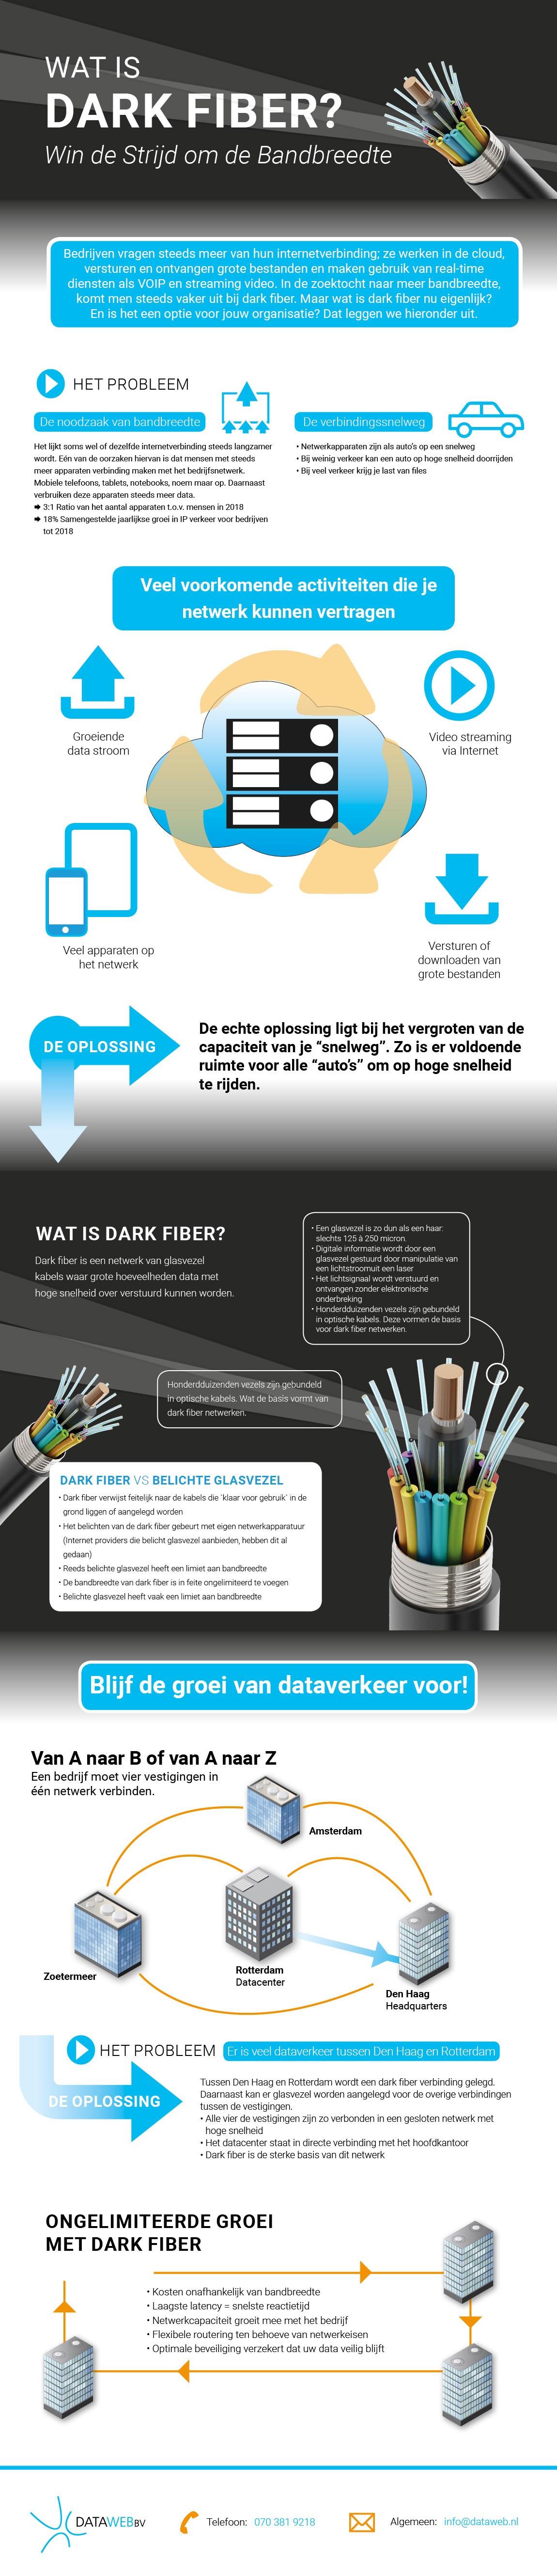 dark fiber win de strijd om bandbreedte